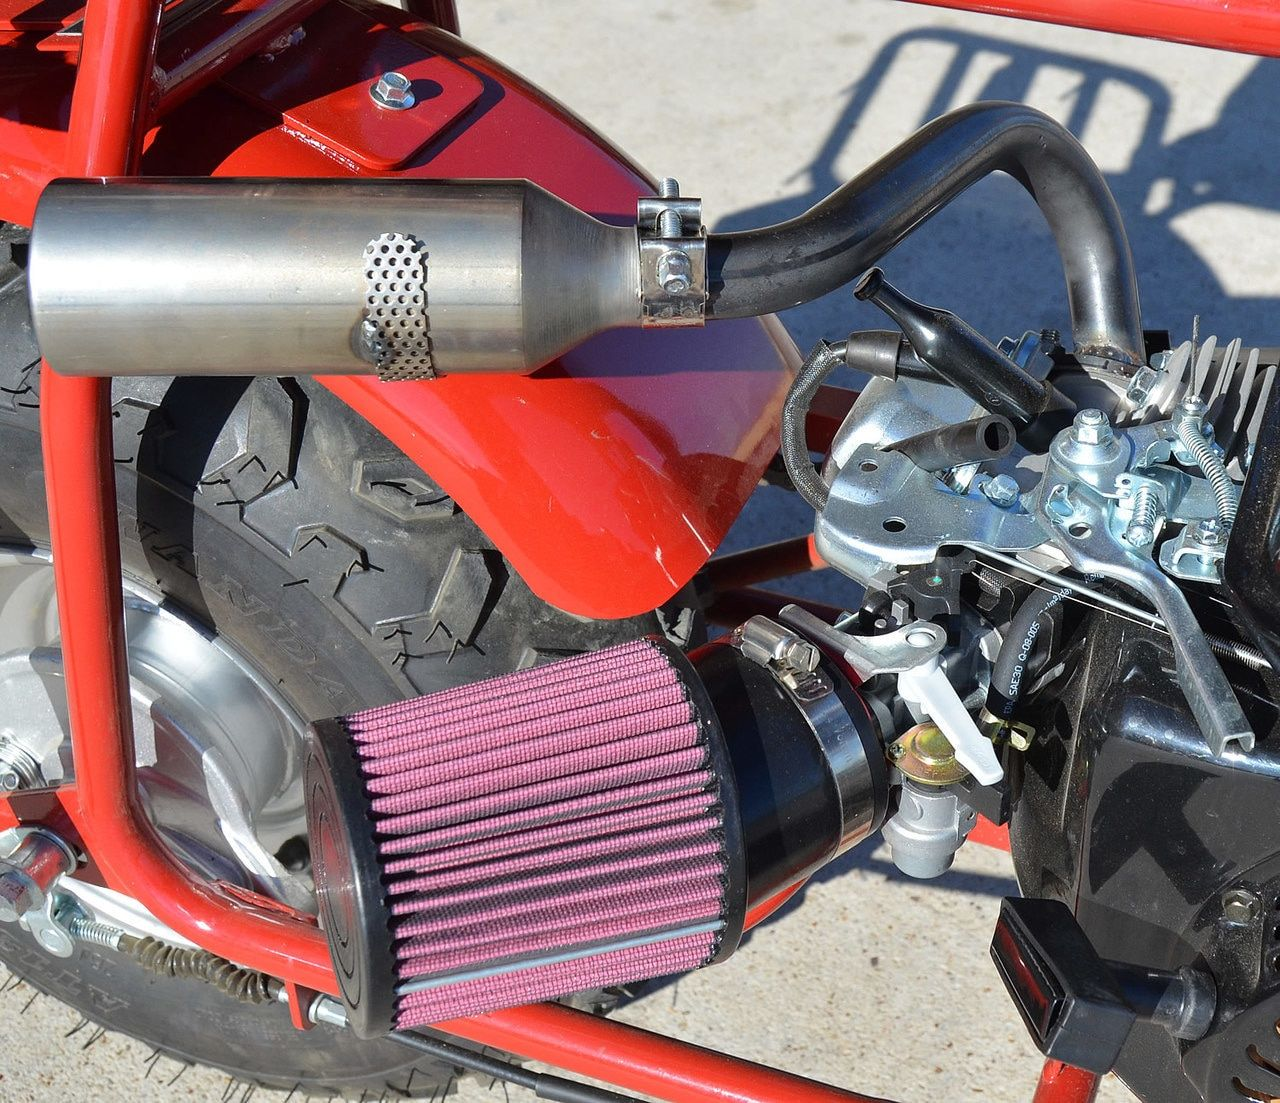 Coleman Ct200u Ex Mb200 Baja Warrior Performance Kit Mini Bike Coleman Go Kart